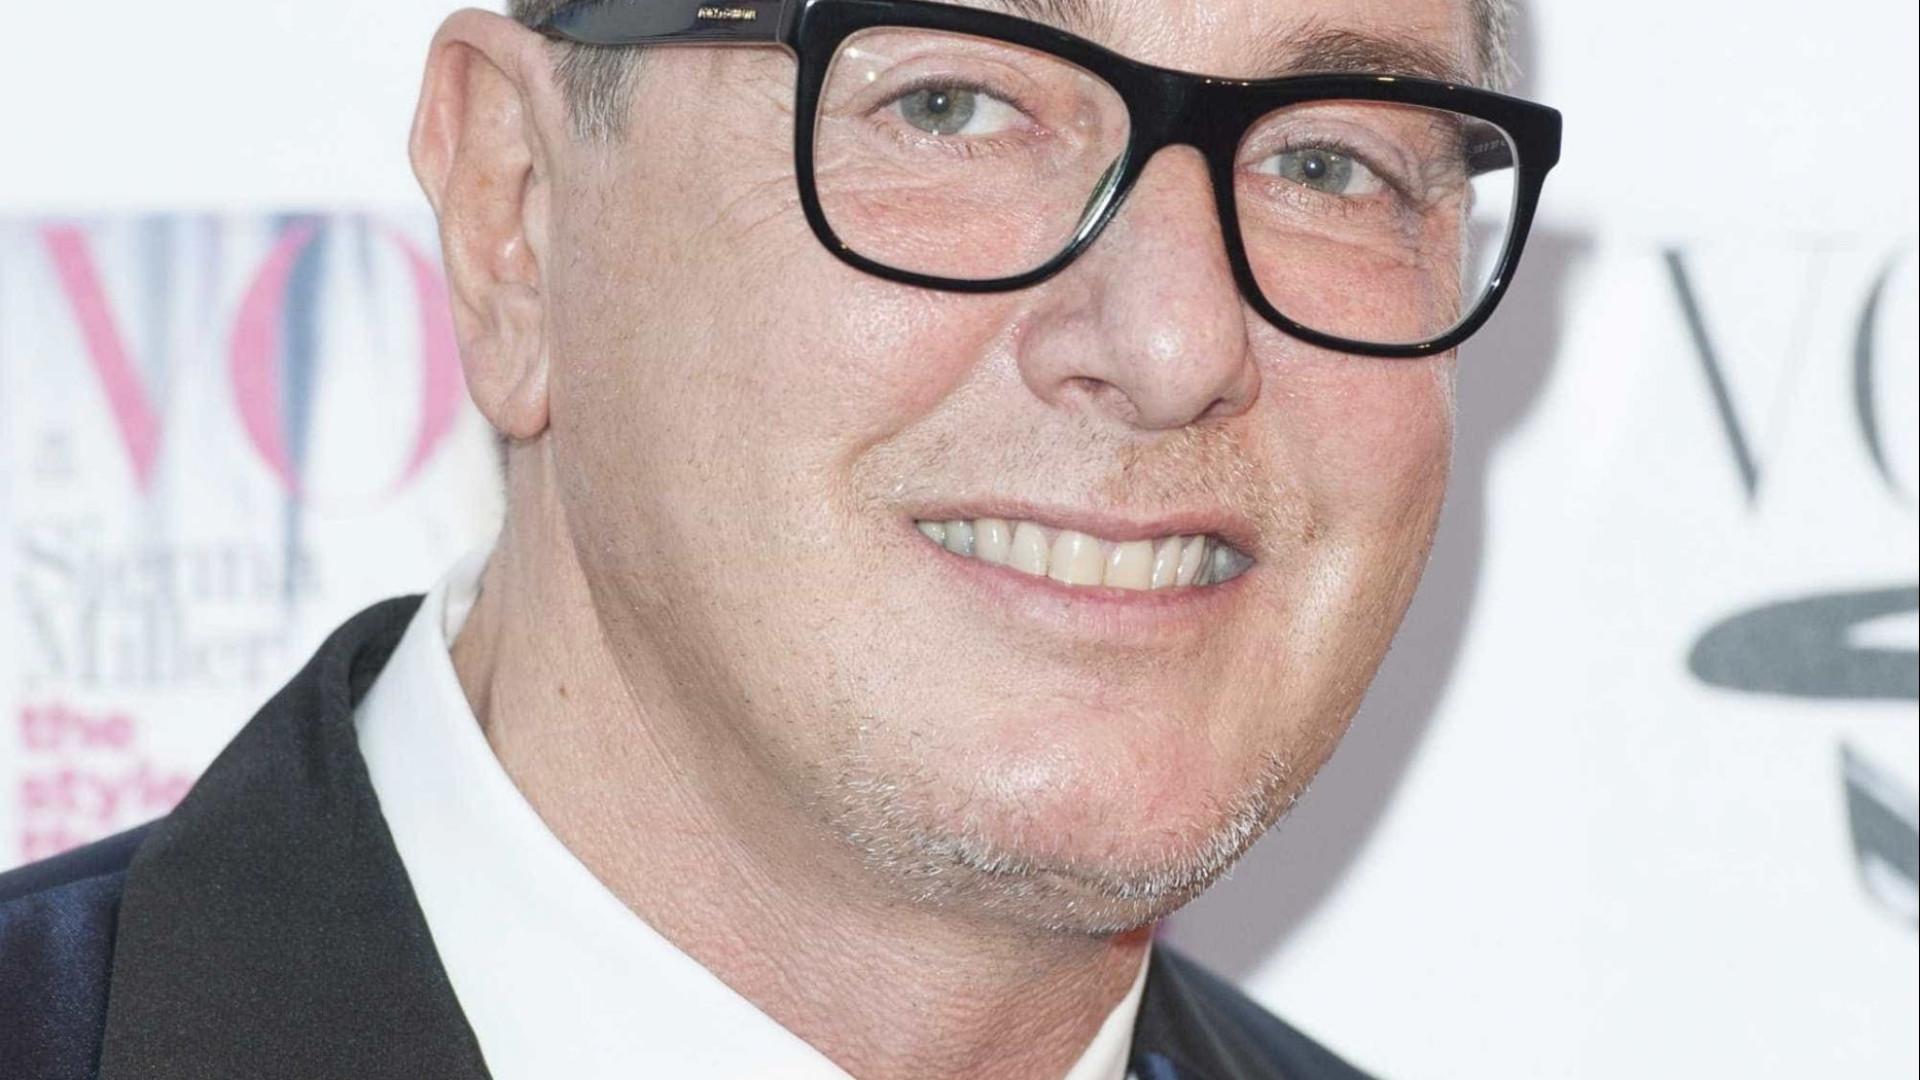 Stefano Gabbana anuncia que vai abandonar Instagram